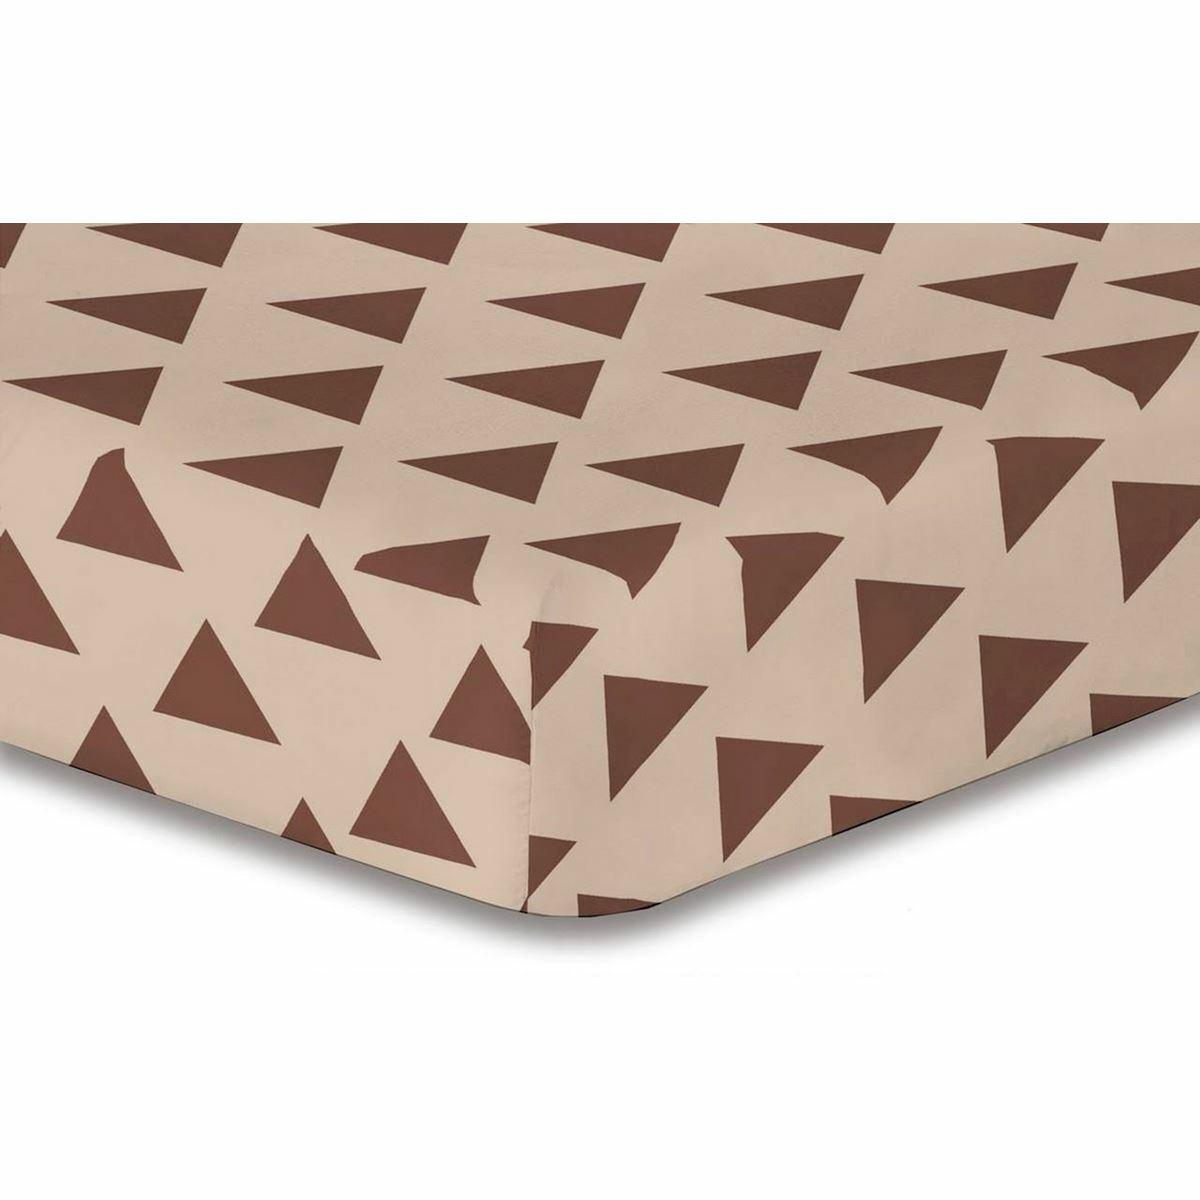 DecoKing Prostěradlo Triangles hnědá S1, 180 x 200 cm